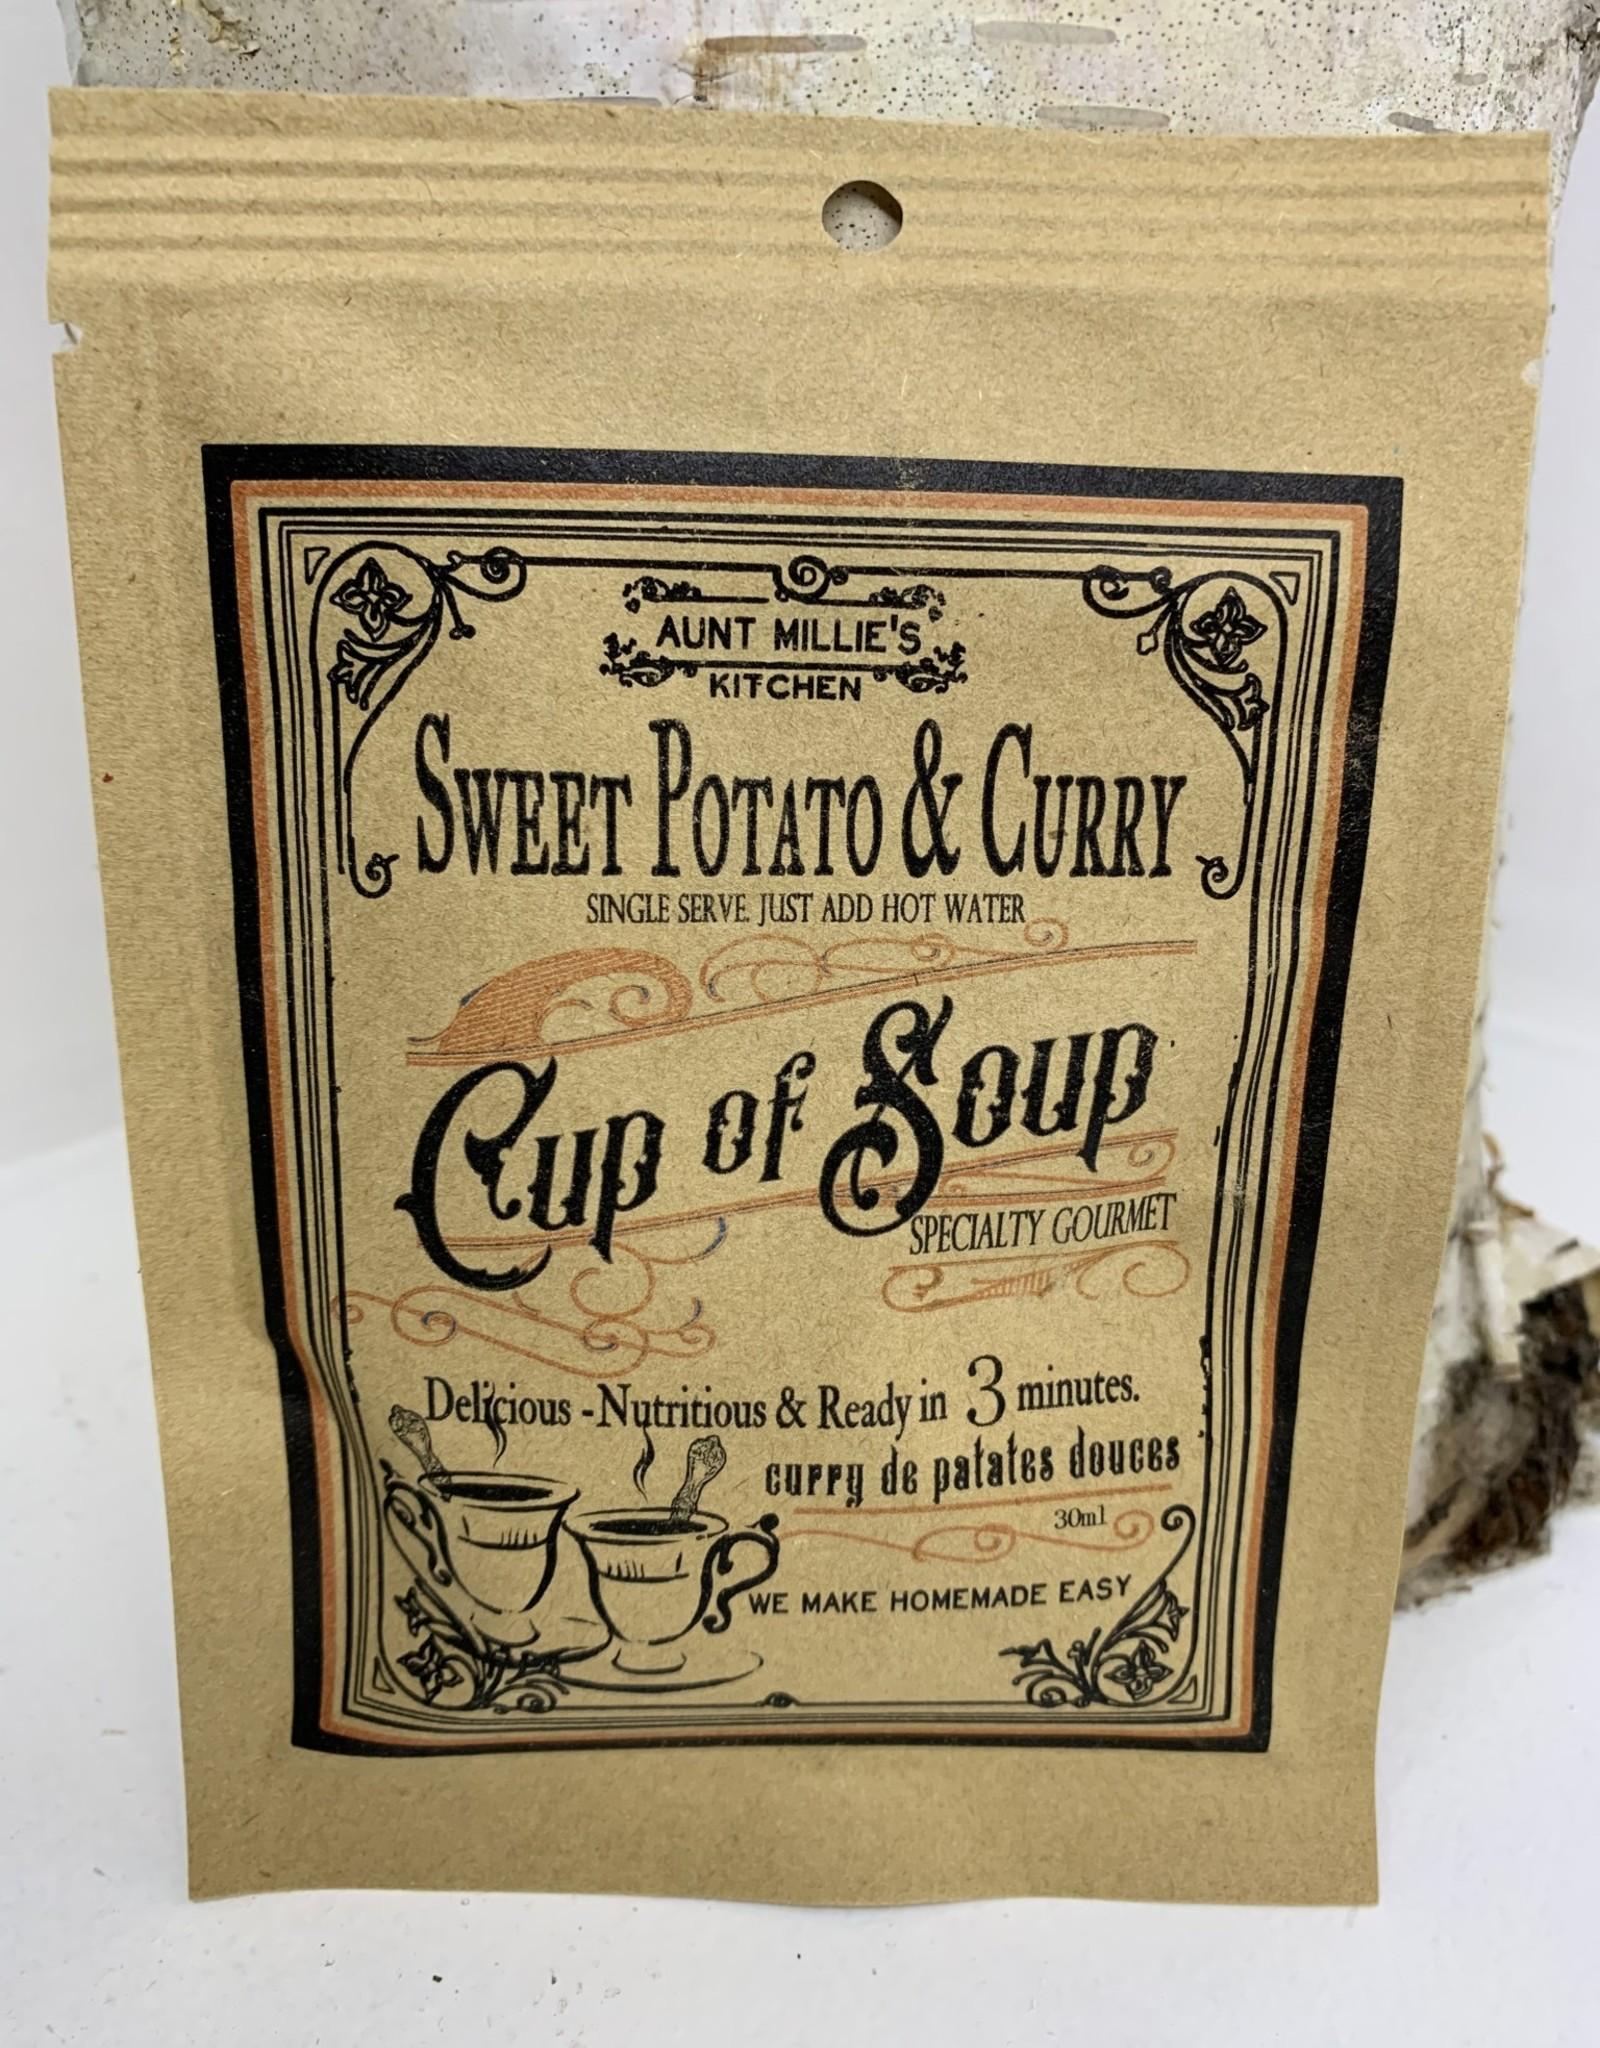 Aunt Millies Kitchen Cup of Soup